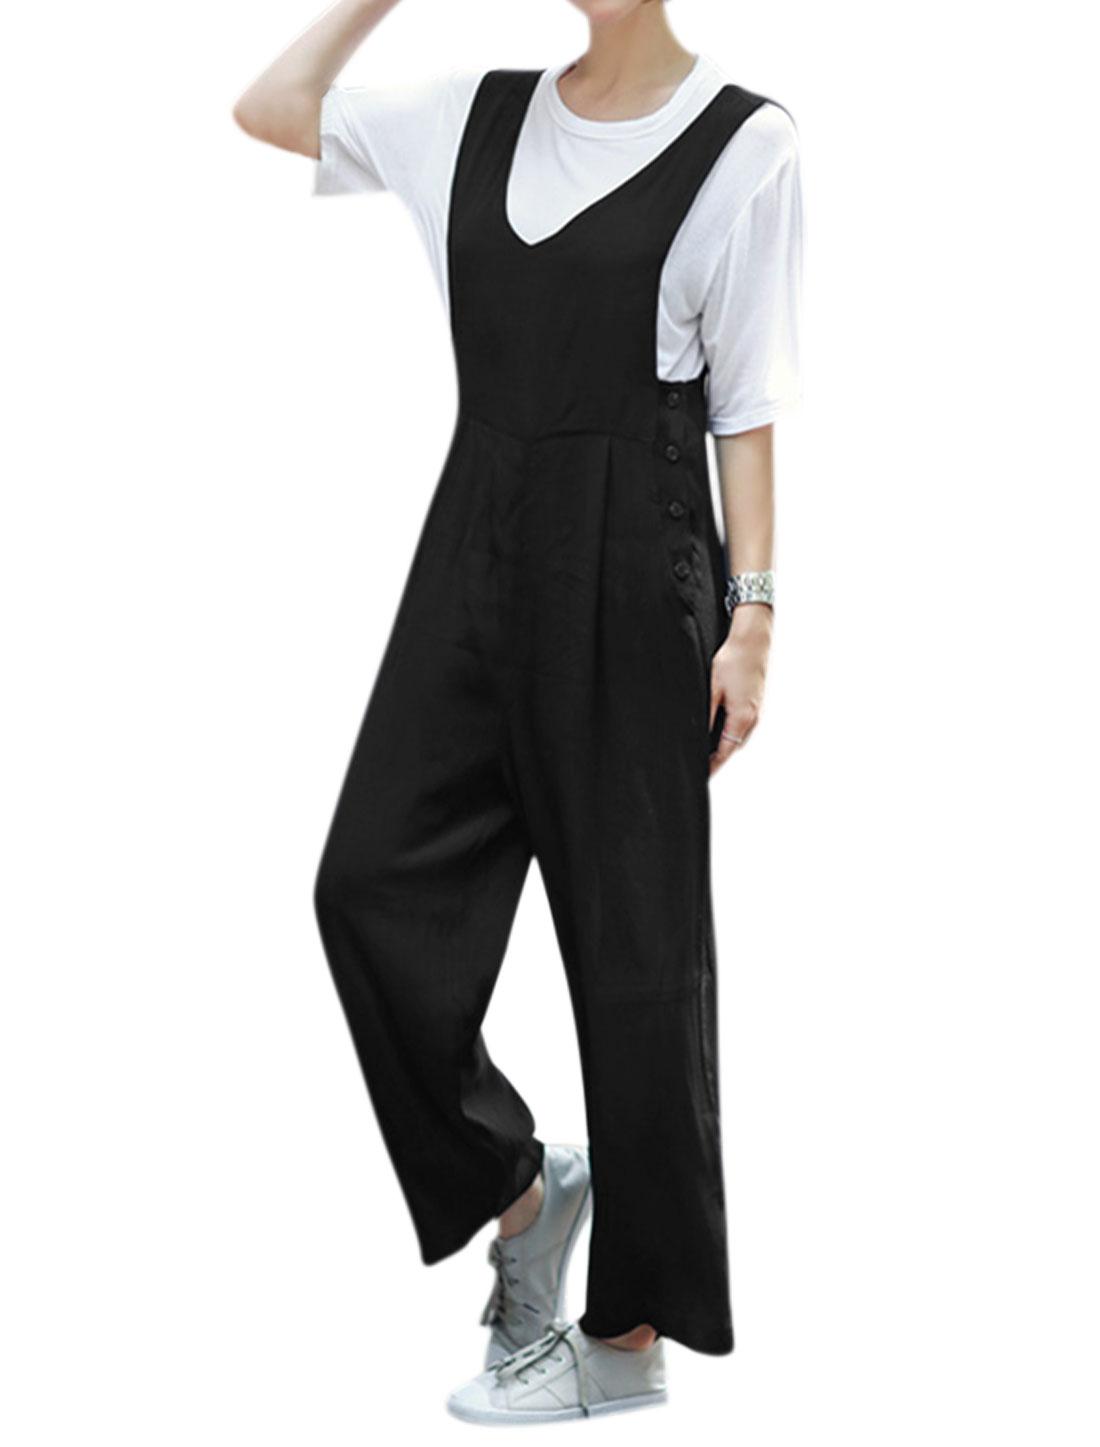 Women V Neckline Buttons Sides Wide Legs Suspender Pants Black S